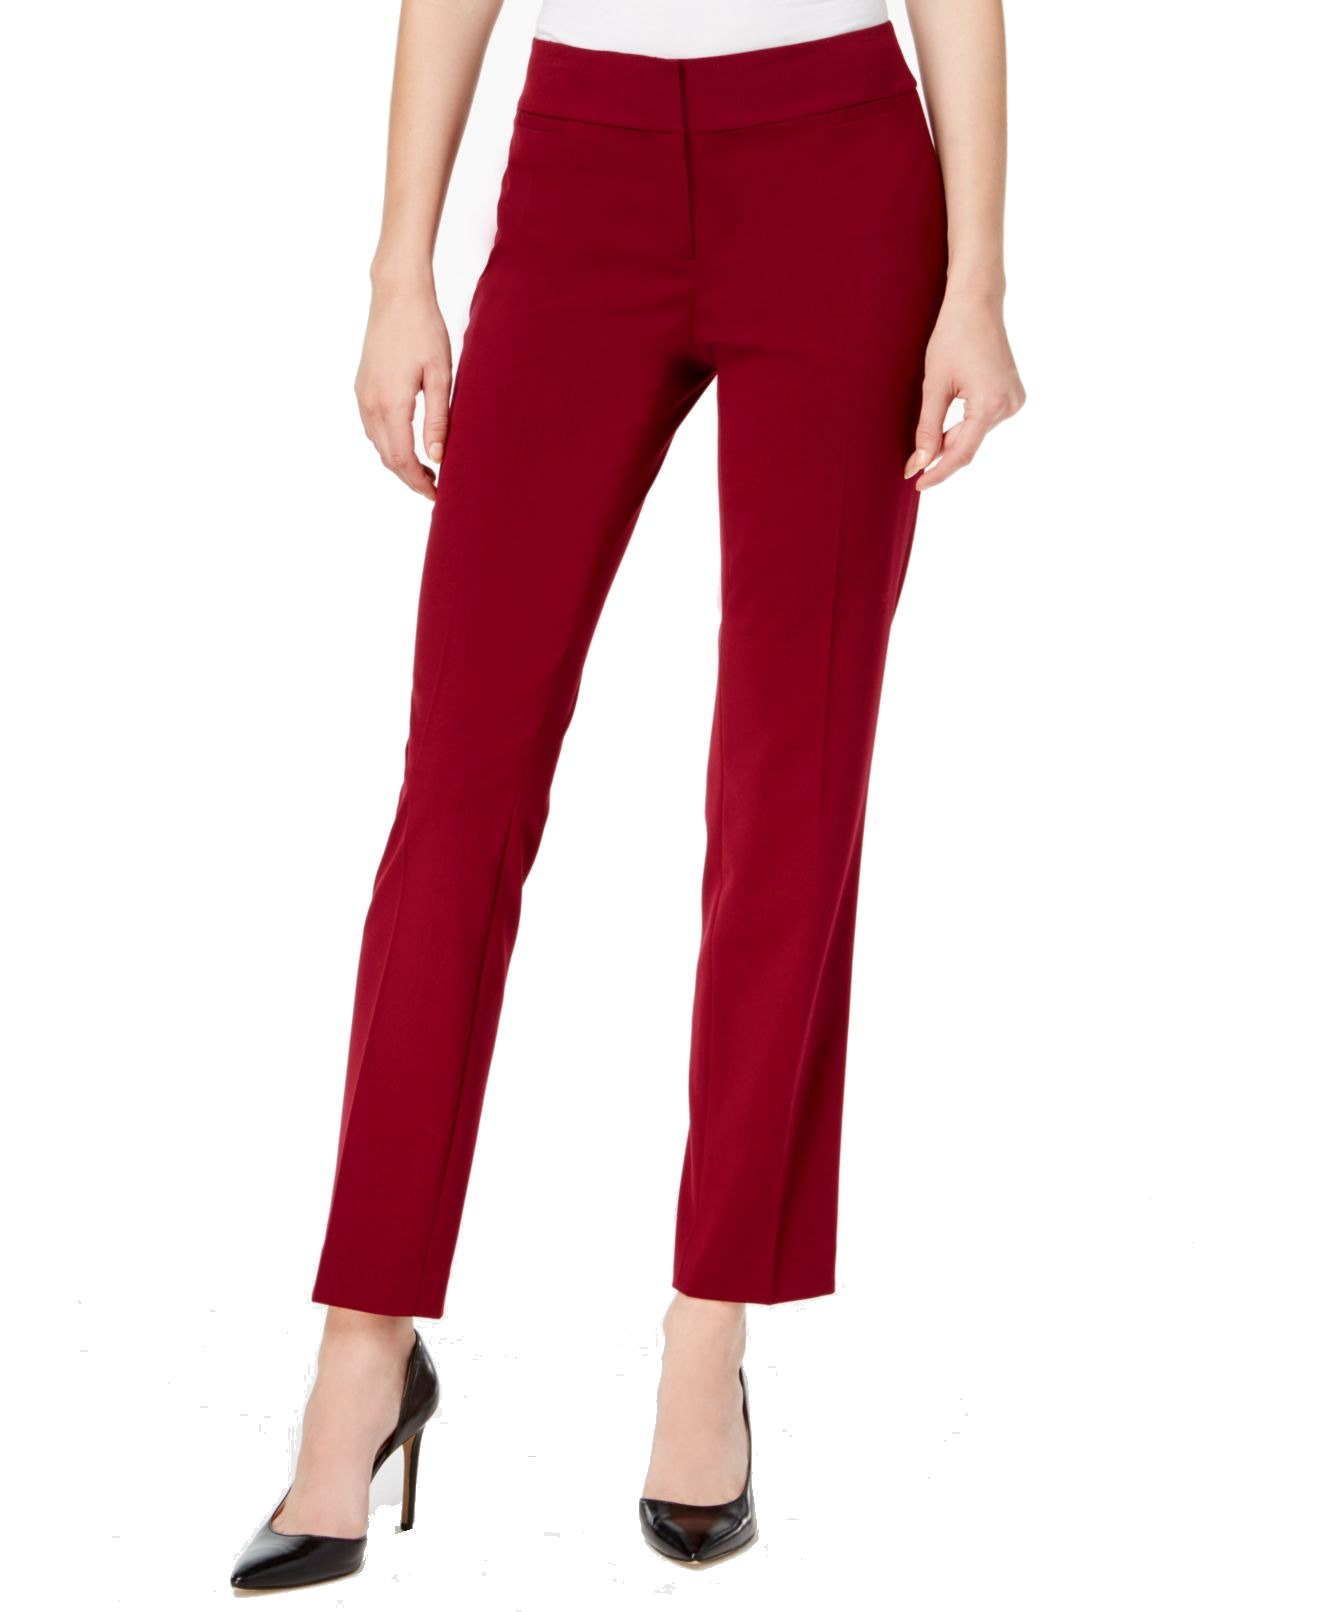 Women's Stretch Straight Leg Dress Pants 10